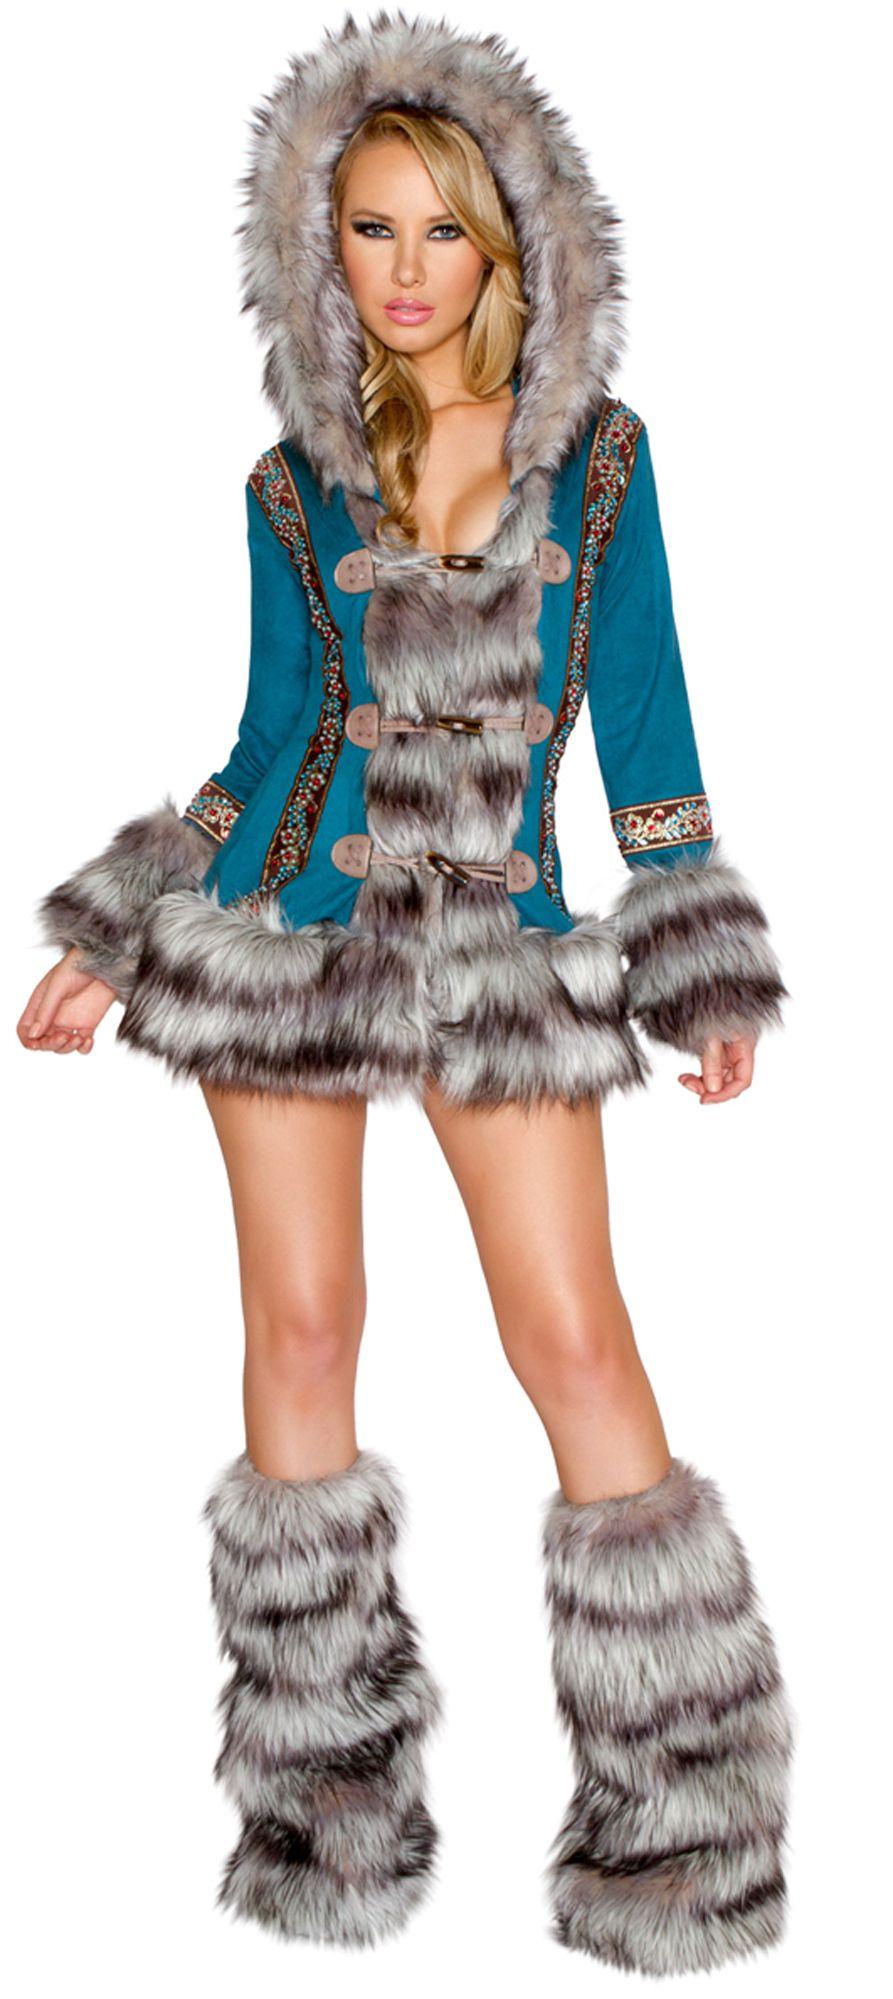 Turquoise eskimo costume jv cc227 eskimo costume features a blue turquoise eskimo costume jv cc227 eskimo costume features a blue long sleeve coat with gray furry trim multiple toggle closure and attached hood with gray solutioingenieria Choice Image